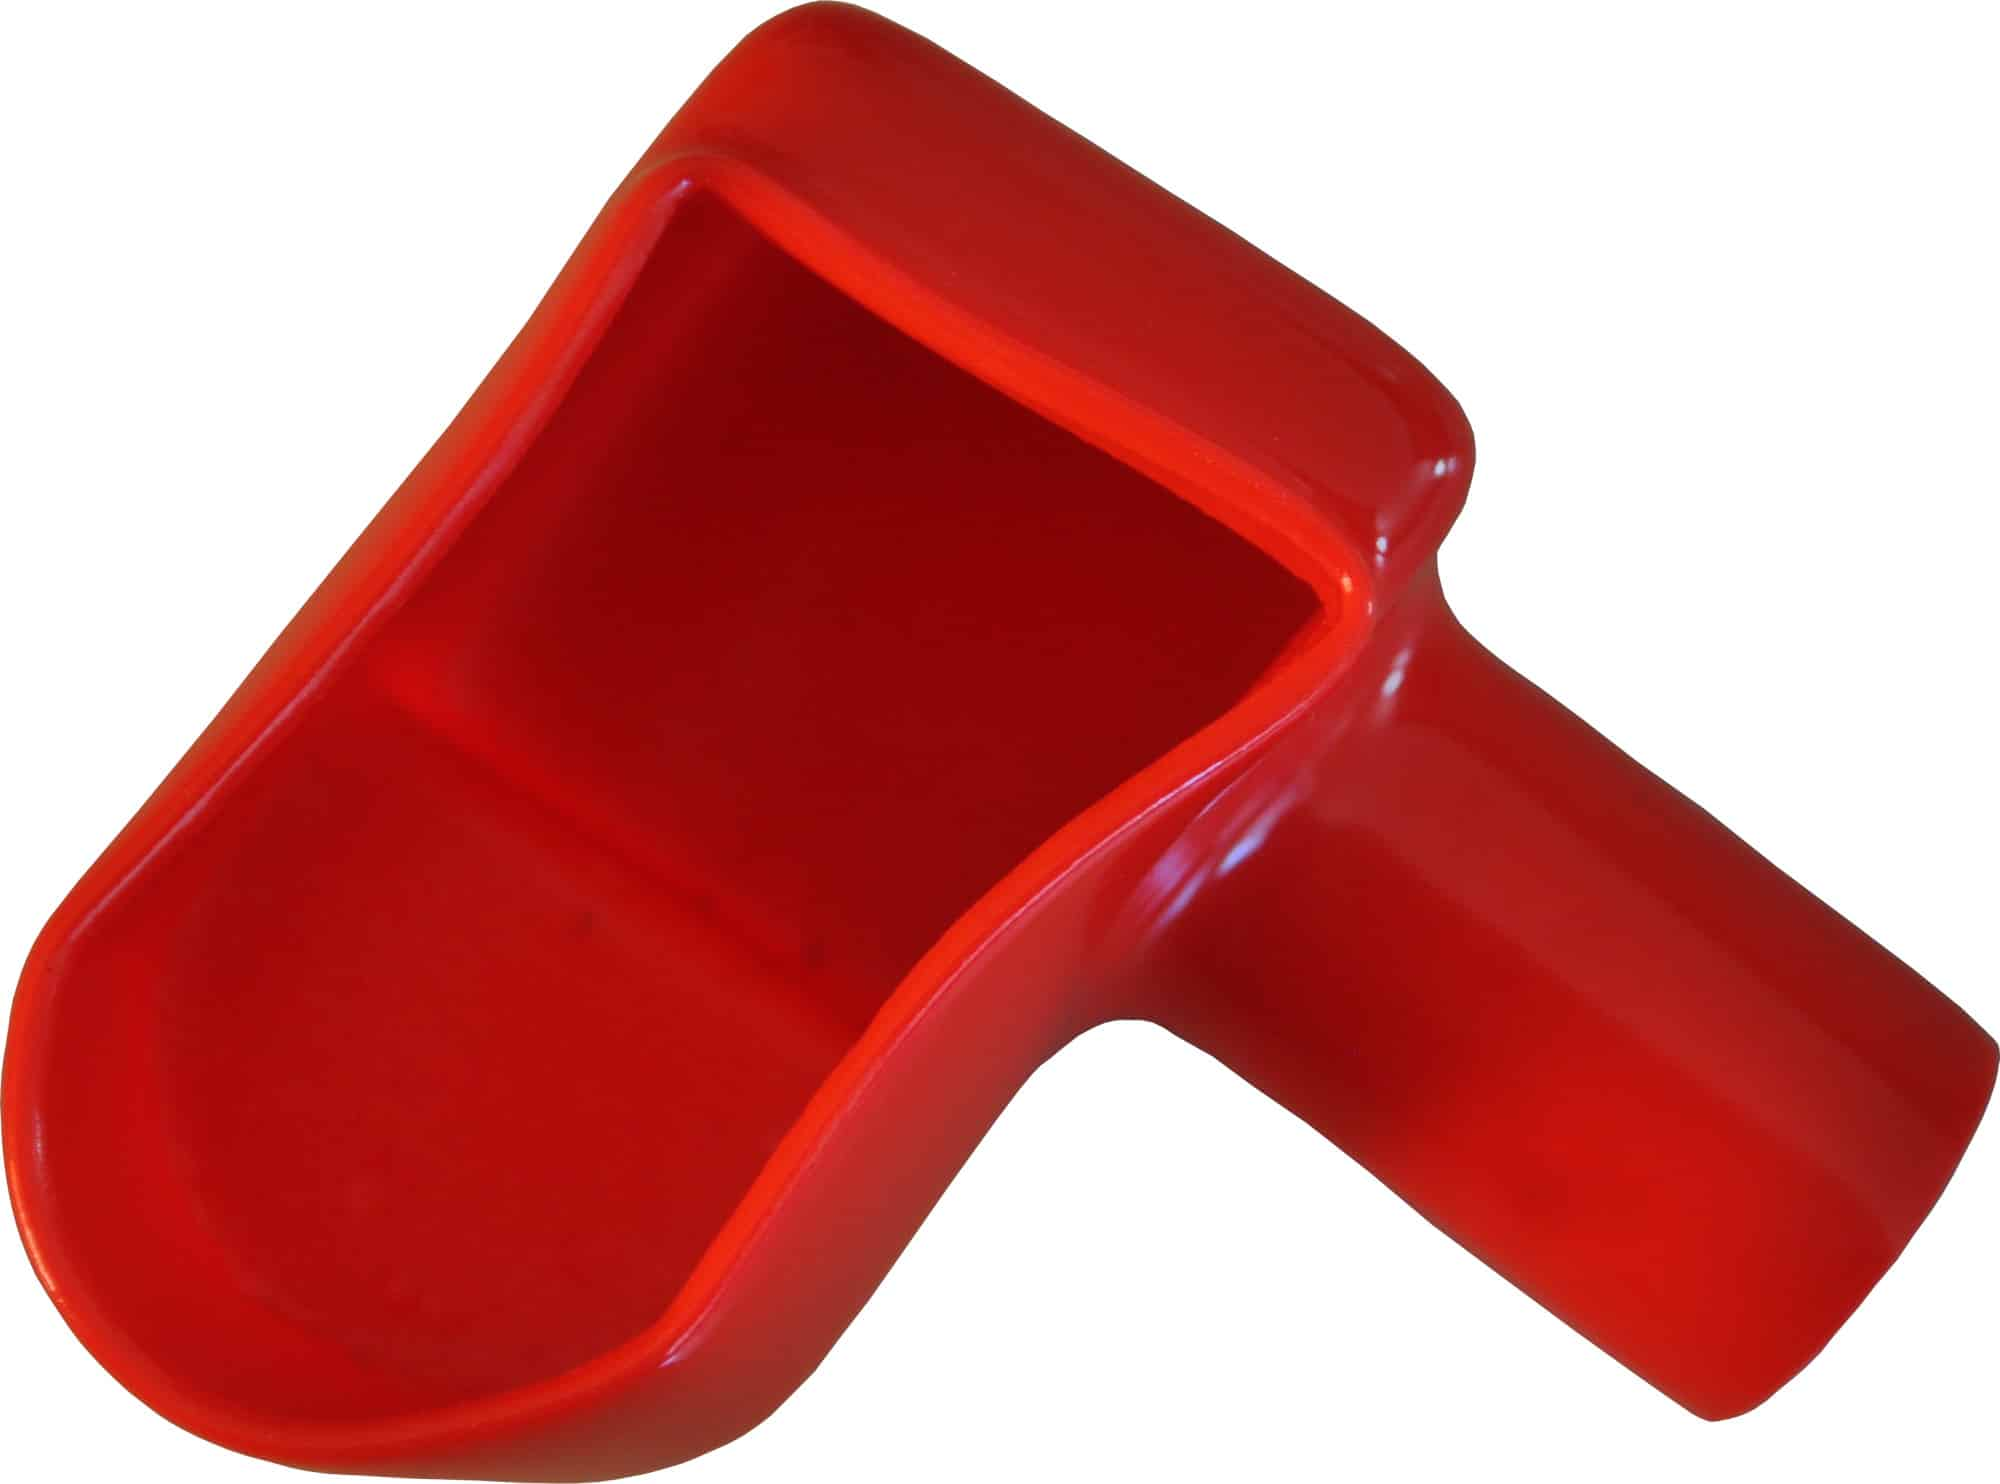 Kappe hætte til batteri polsko rød bil lastbil motorcykel scooter traktor camping beskyttelseskappe støvkappe 020293R RACO